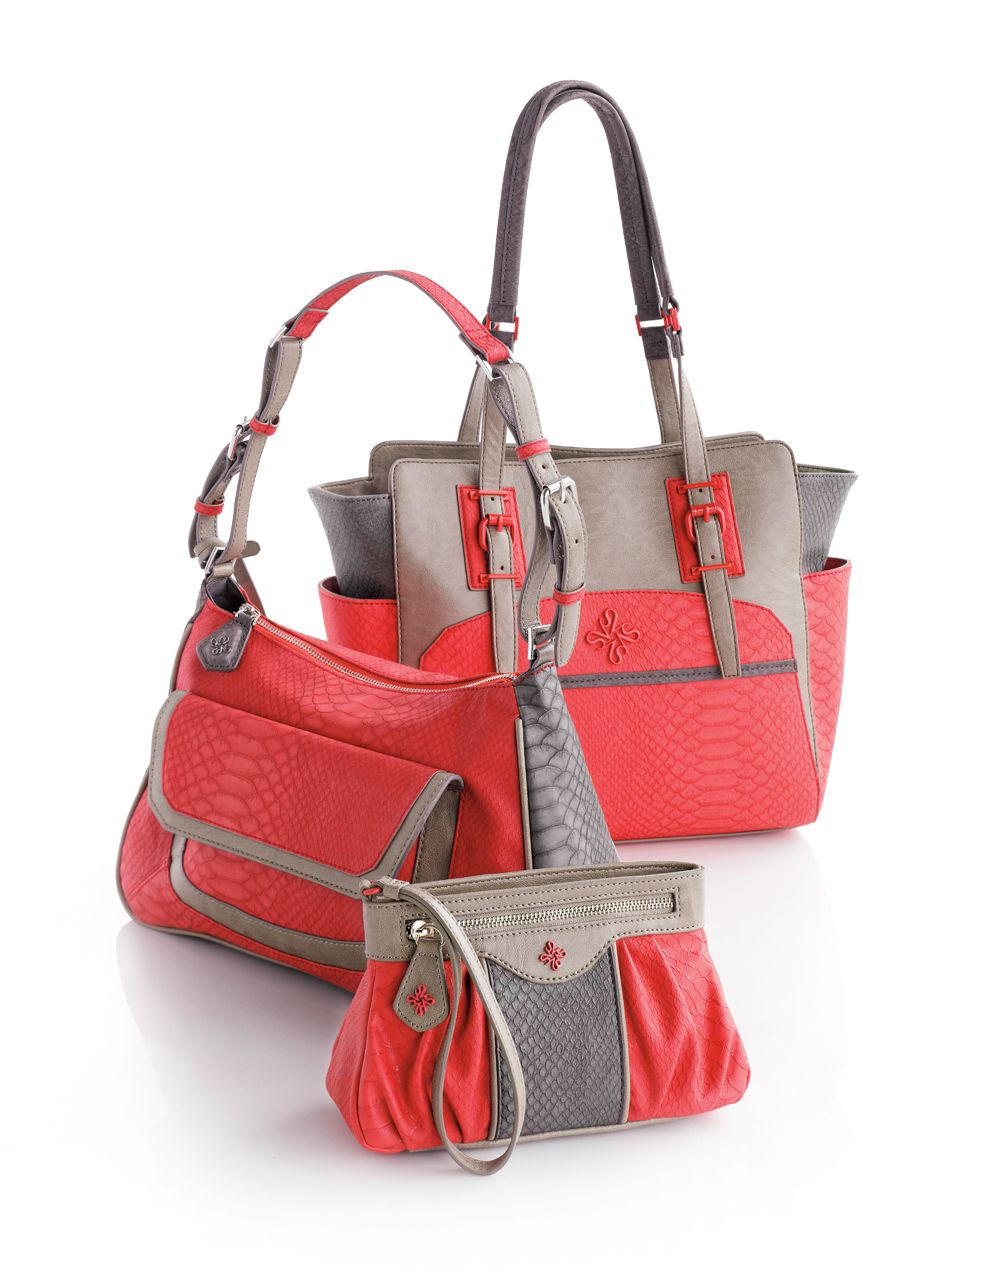 101c46f56953 Three ways to carry coral.  handbags Simply Vera Vera Wang  Kohls ...